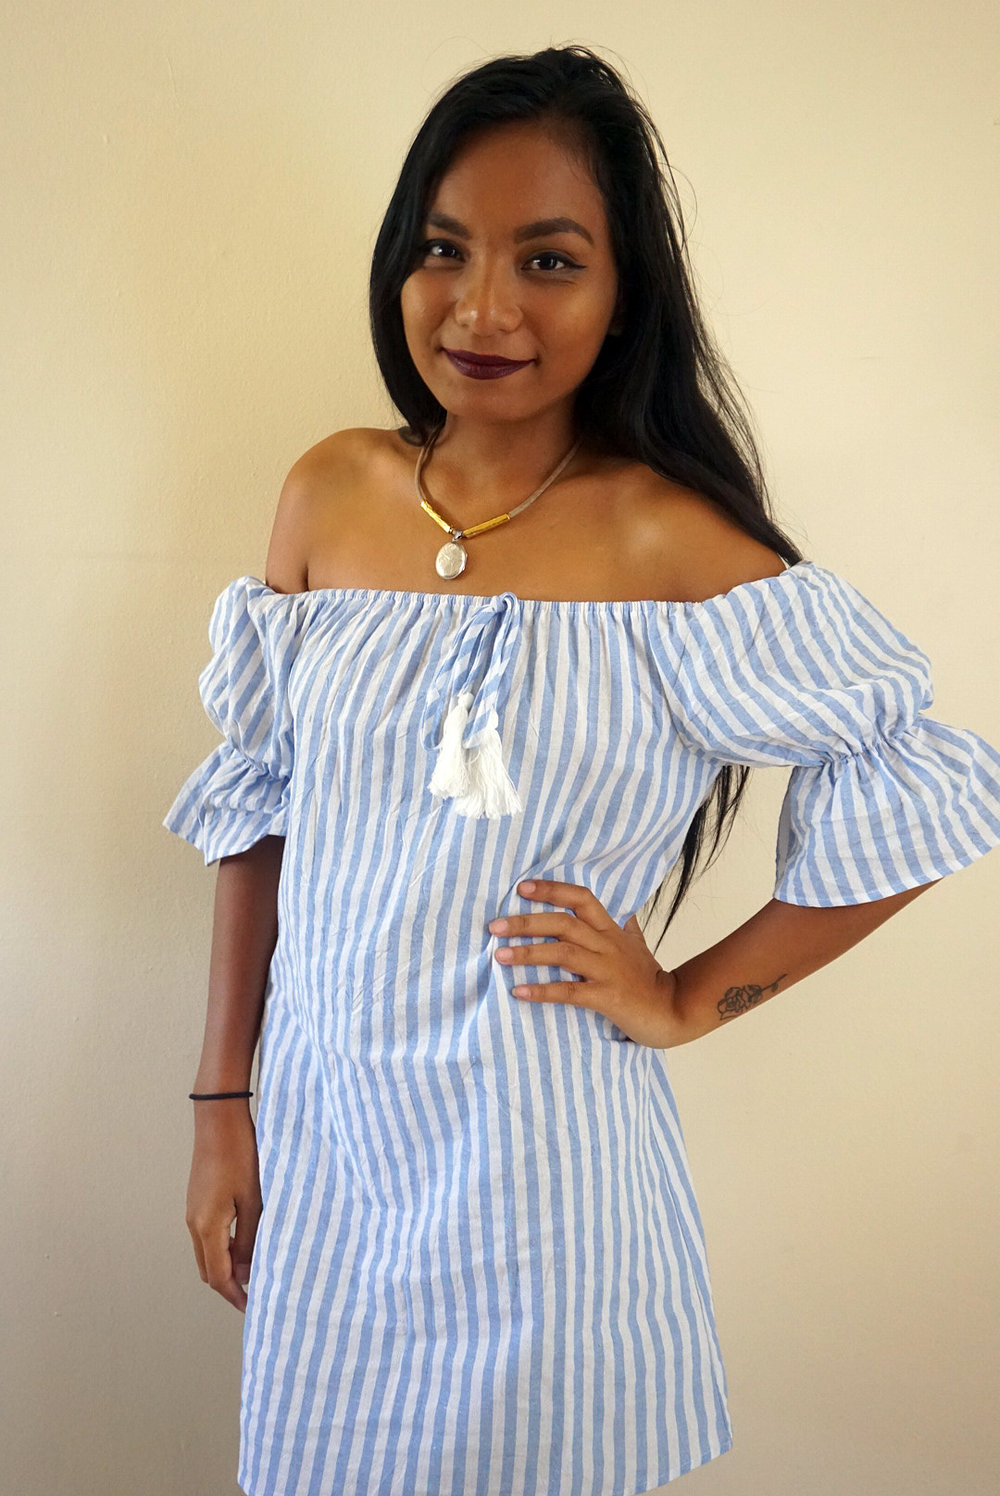 Off-the-shoulder-striped-dress-summer-fall-style-blogger-LINDATENCHITRAN-3-1616x1080.jpg